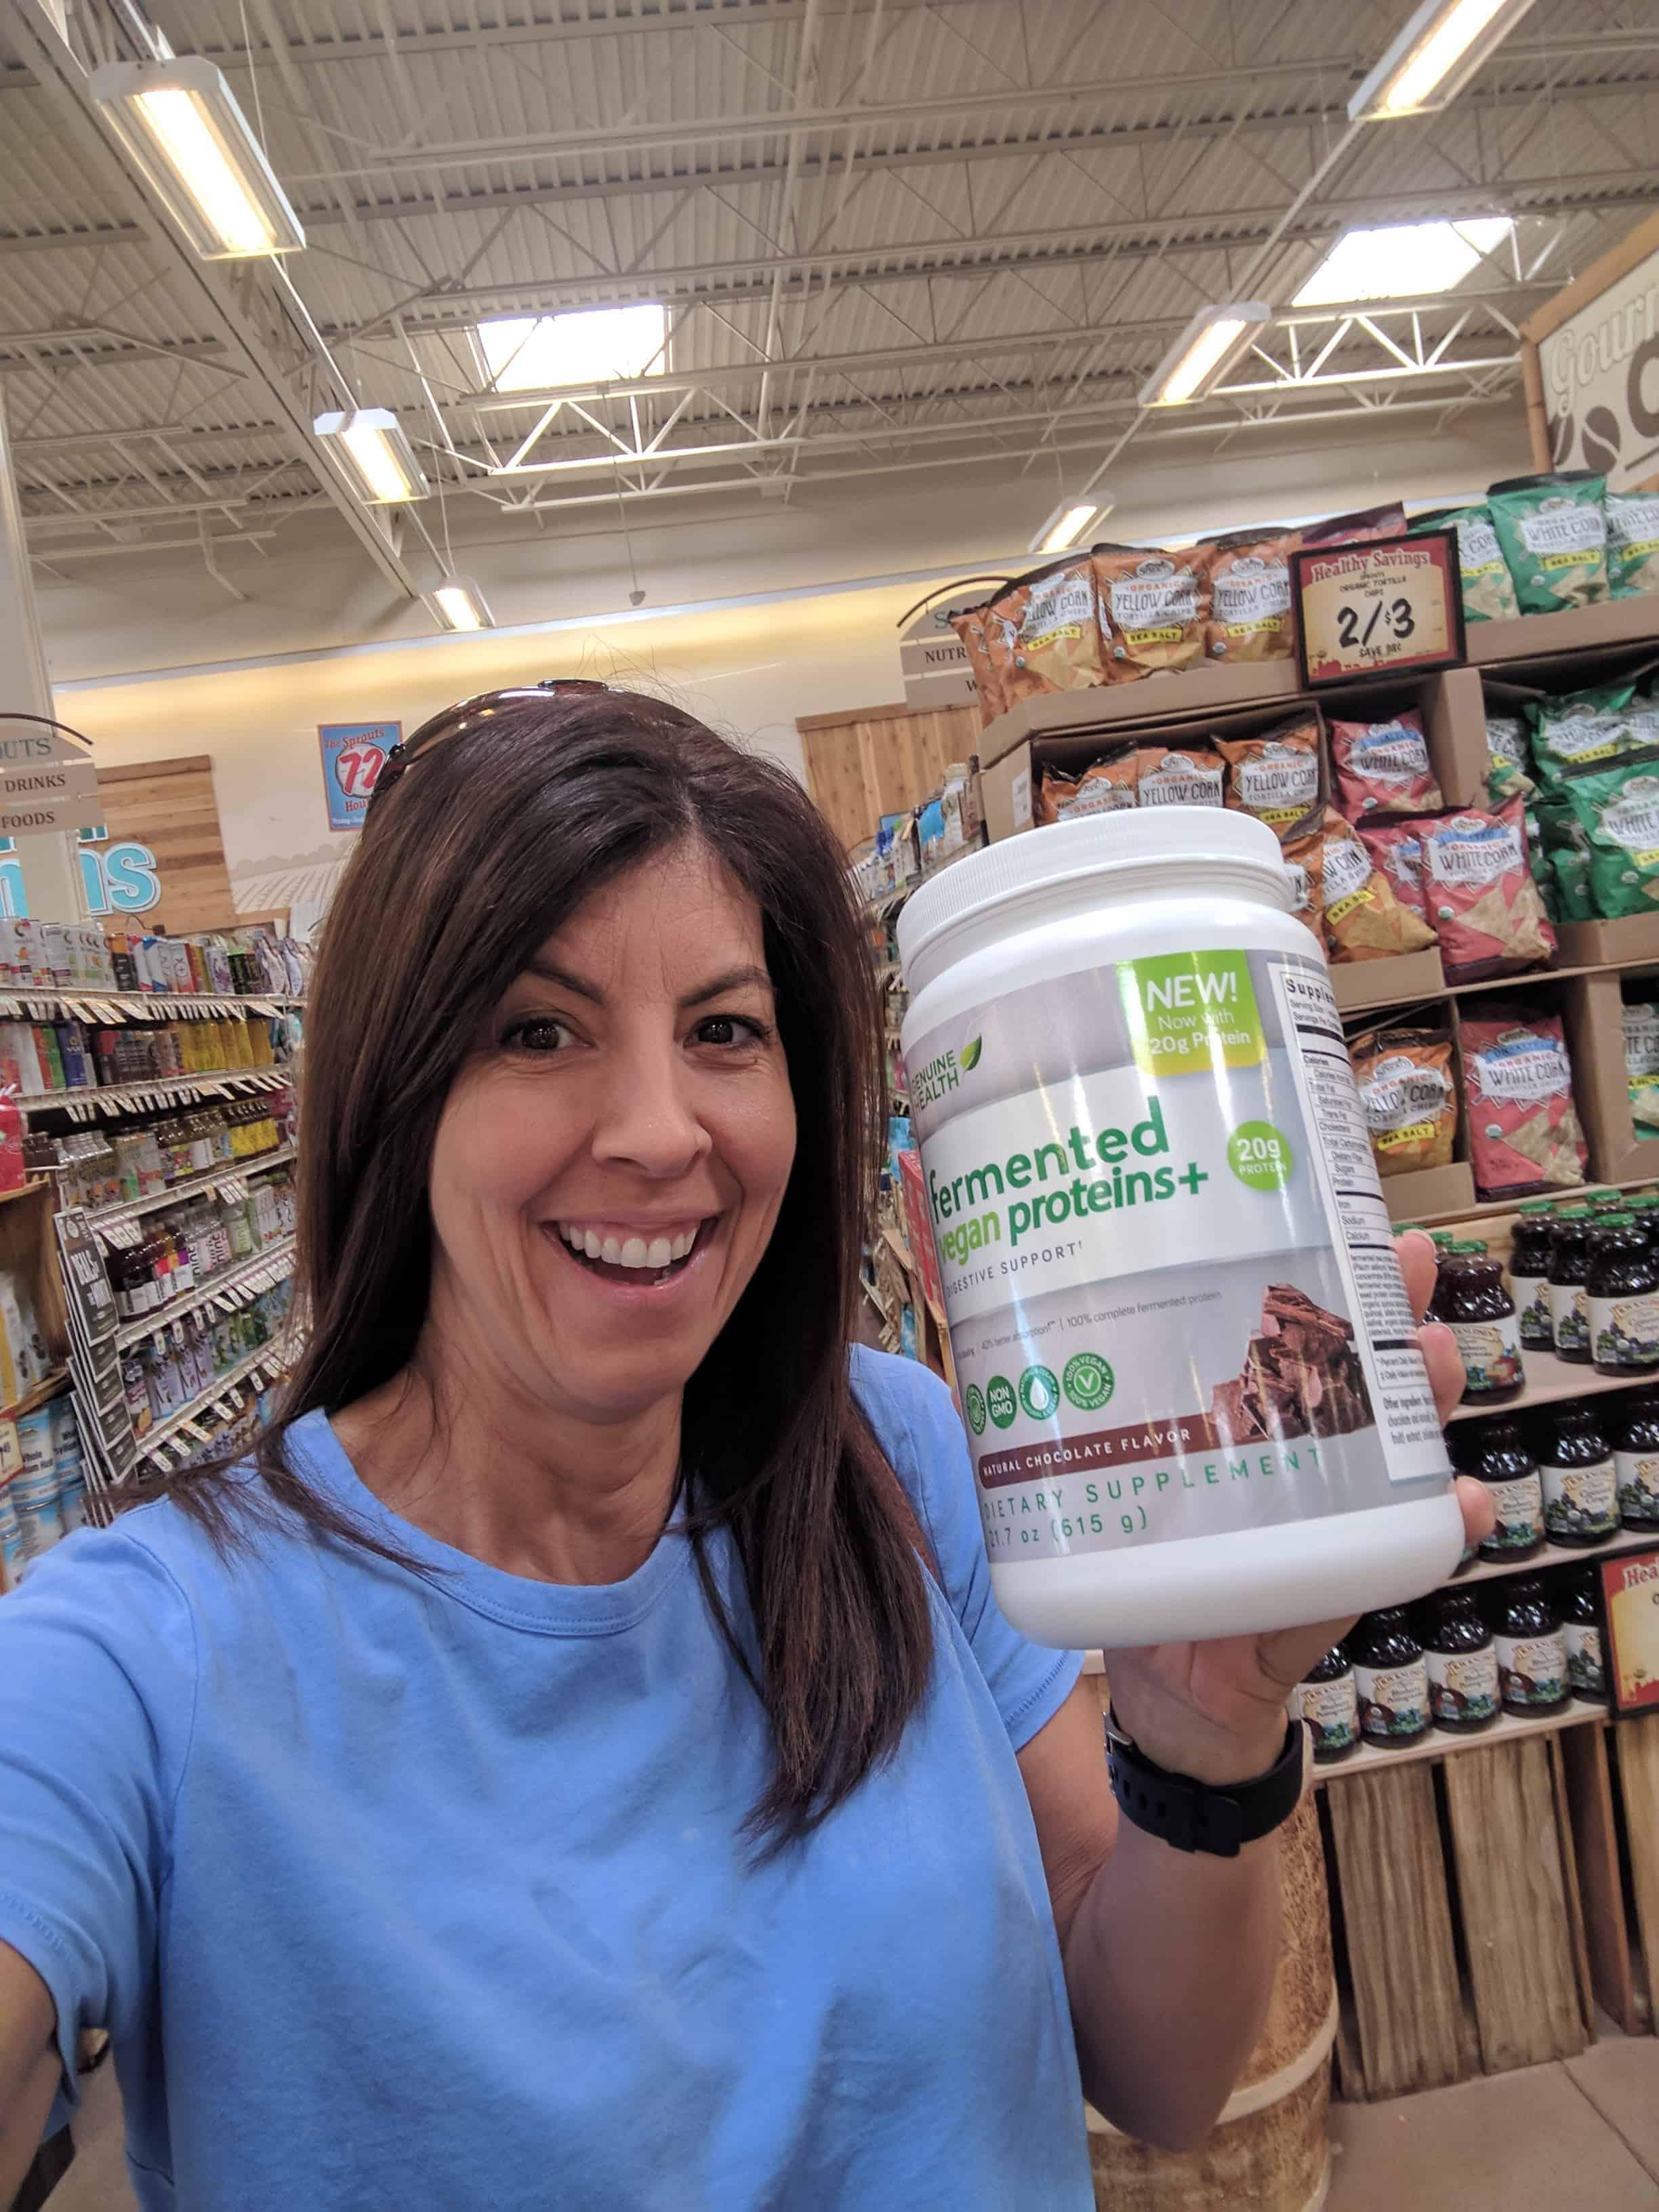 fermented vegan proteins powder